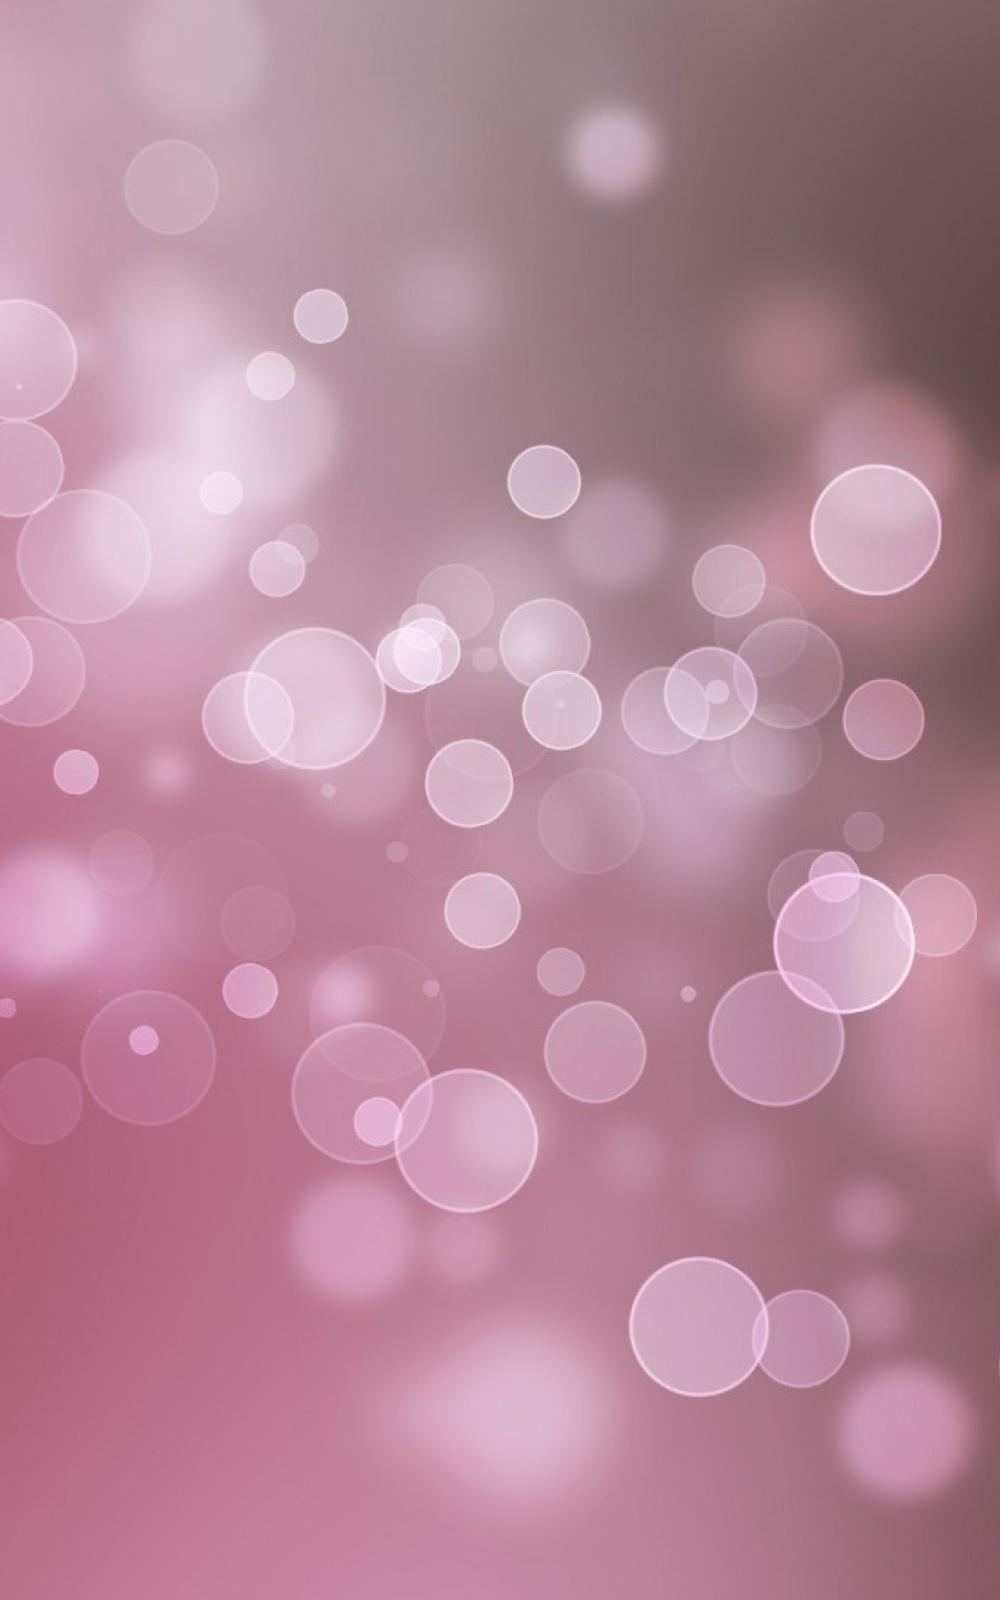 pink bokeh circles android wallpaper free download